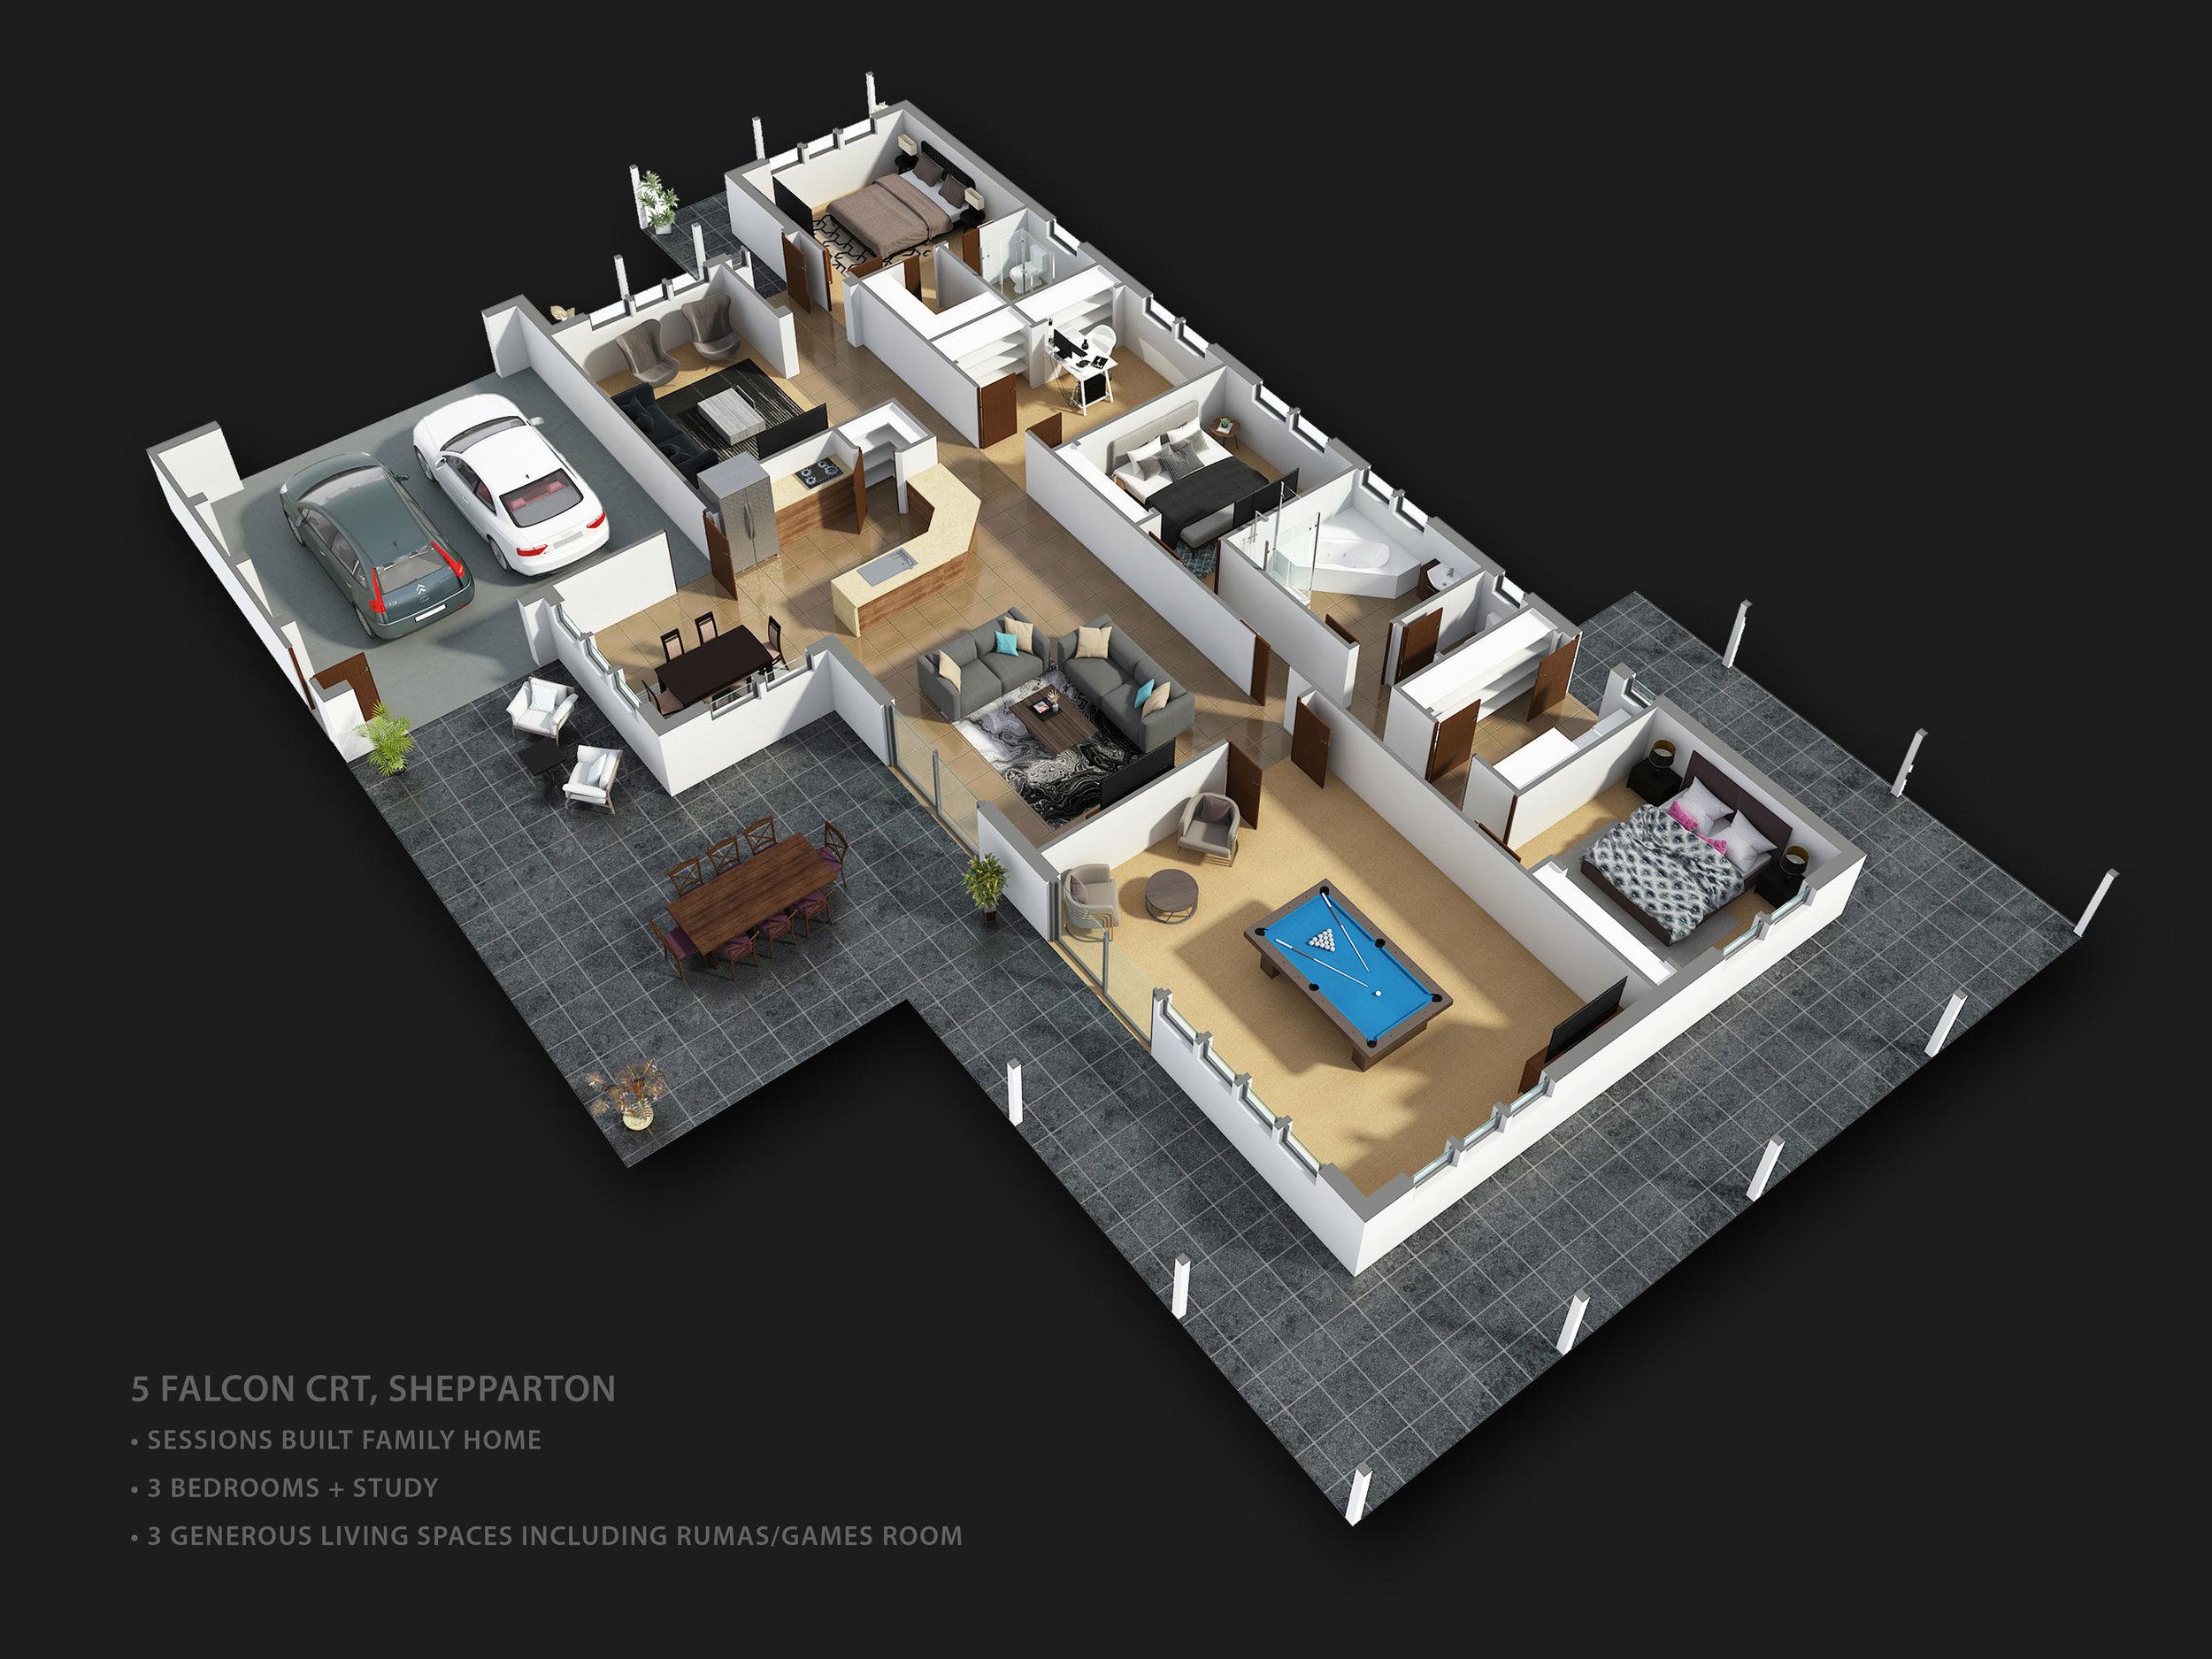 5-Falcon-Crt-Floor-Plan-3D-RENDER.jpg